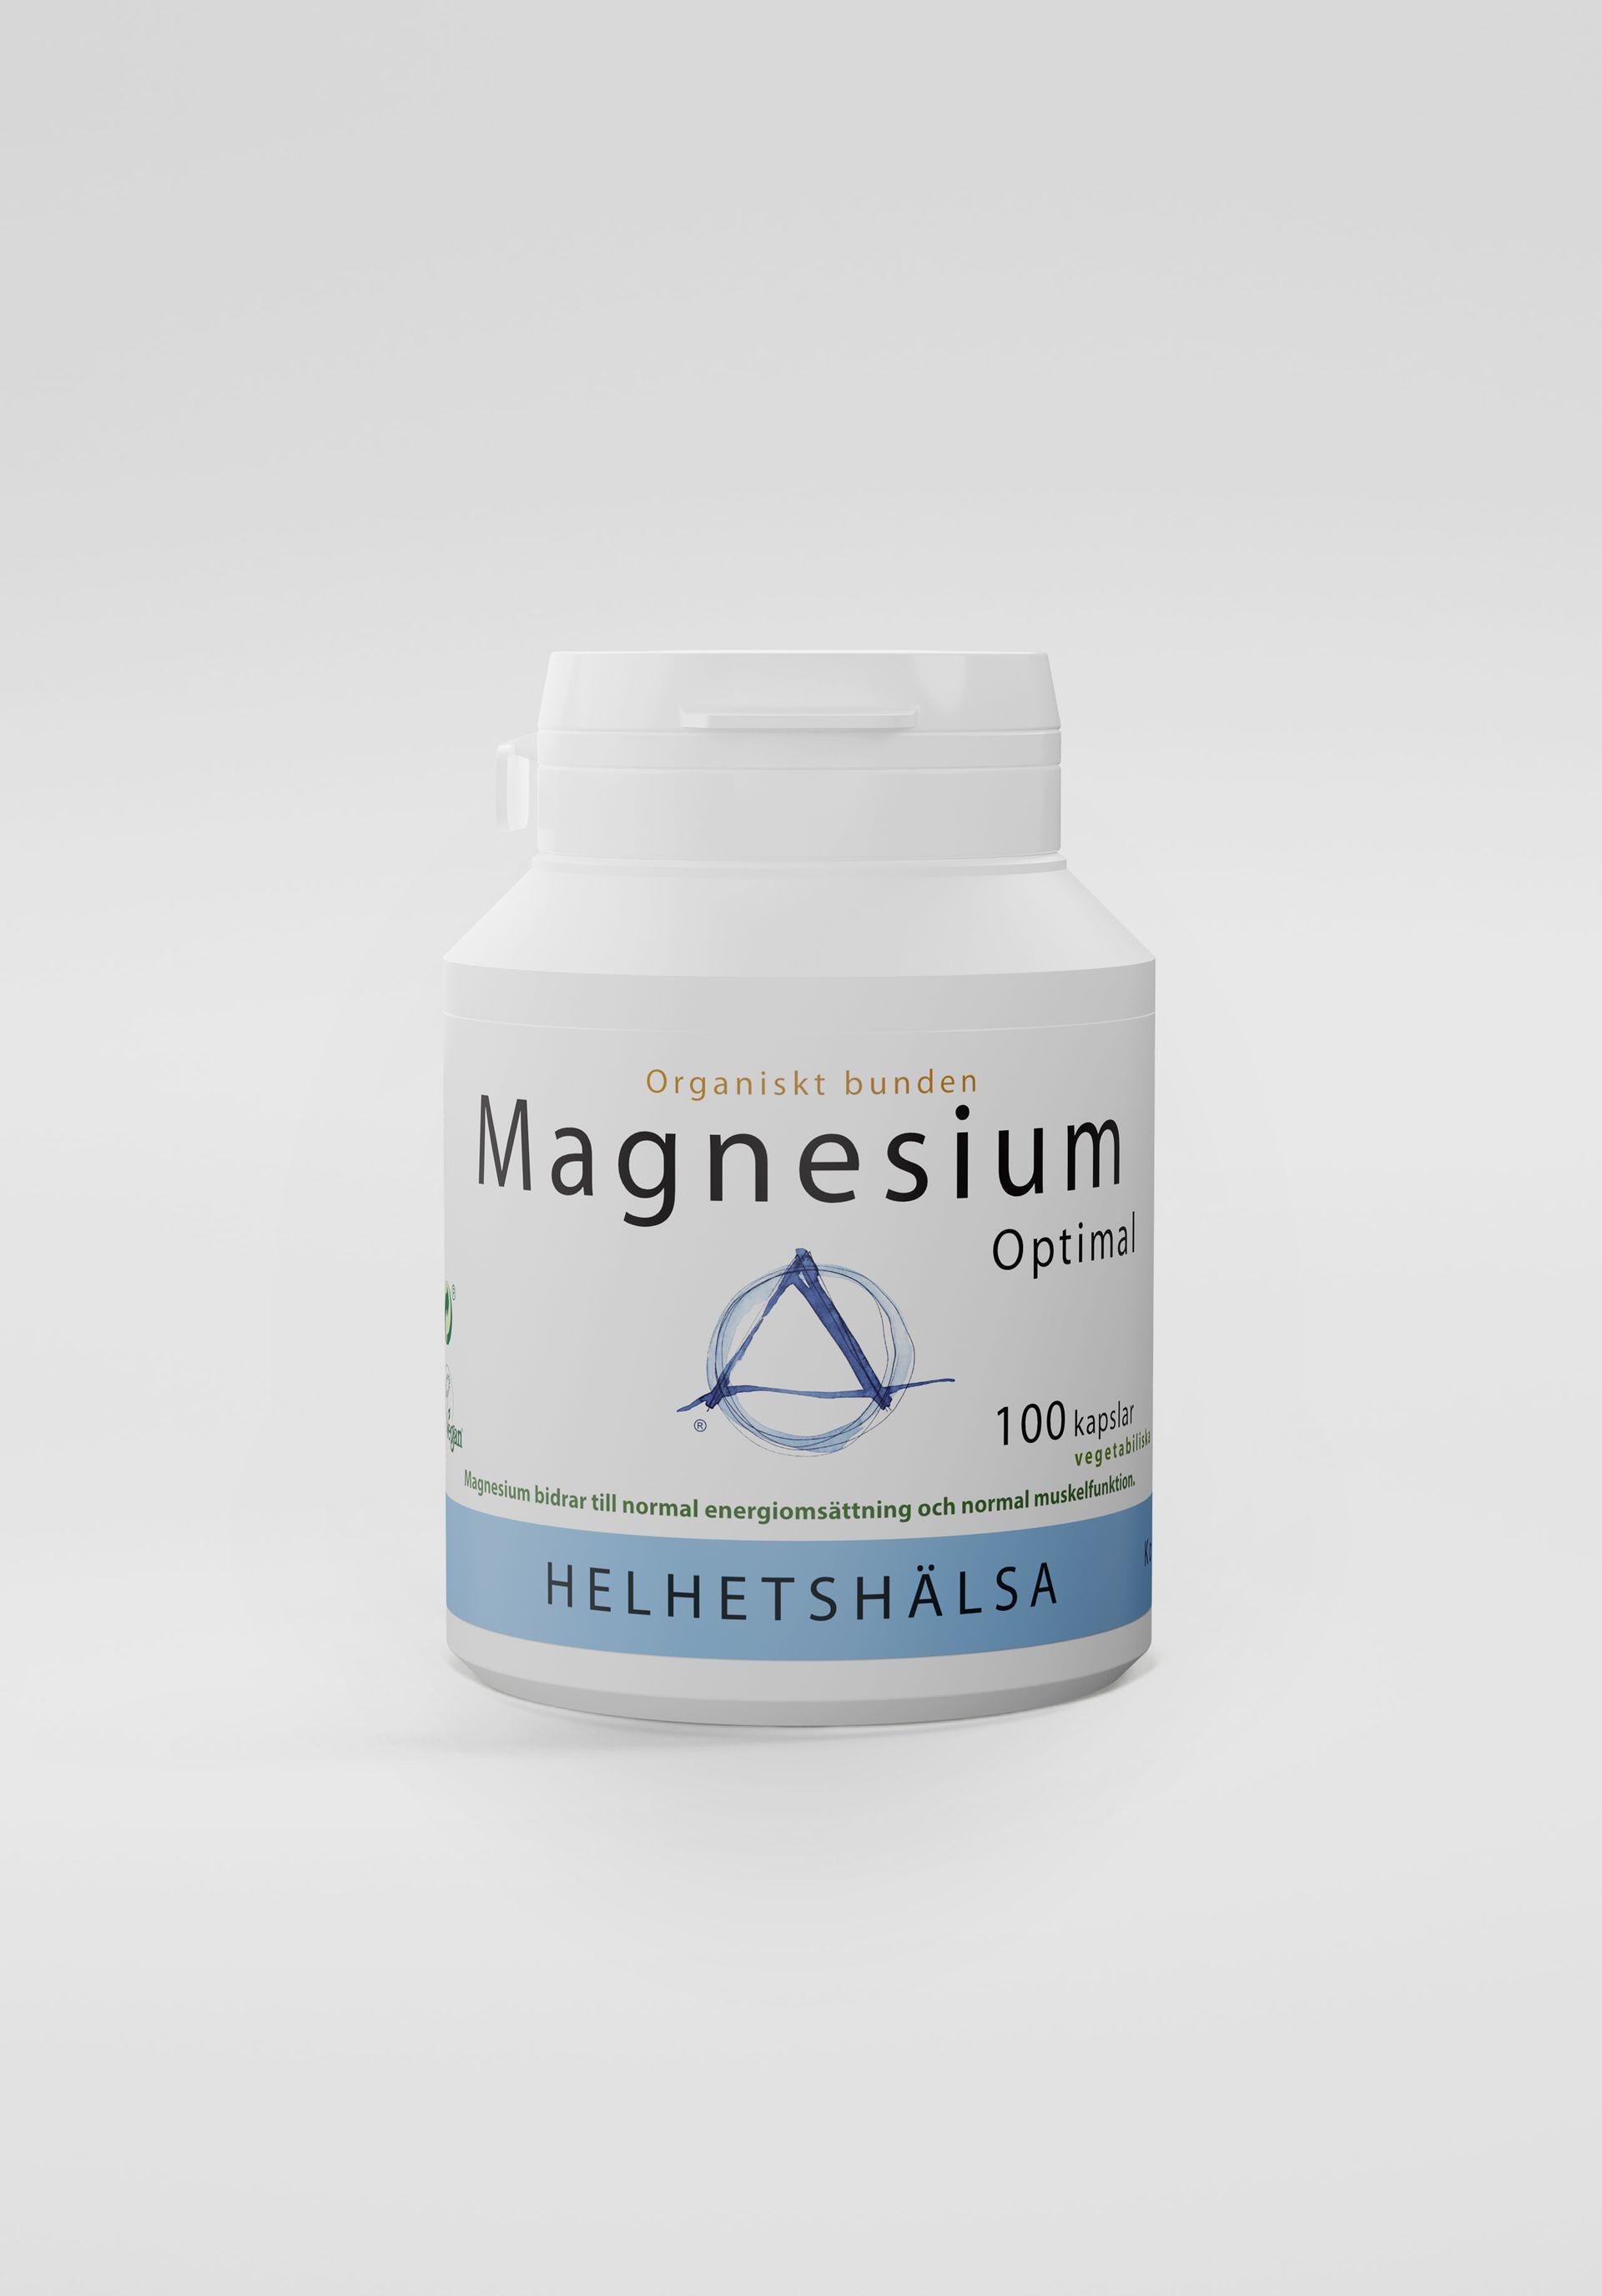 MagnesiumOptimal, 100 kapslar